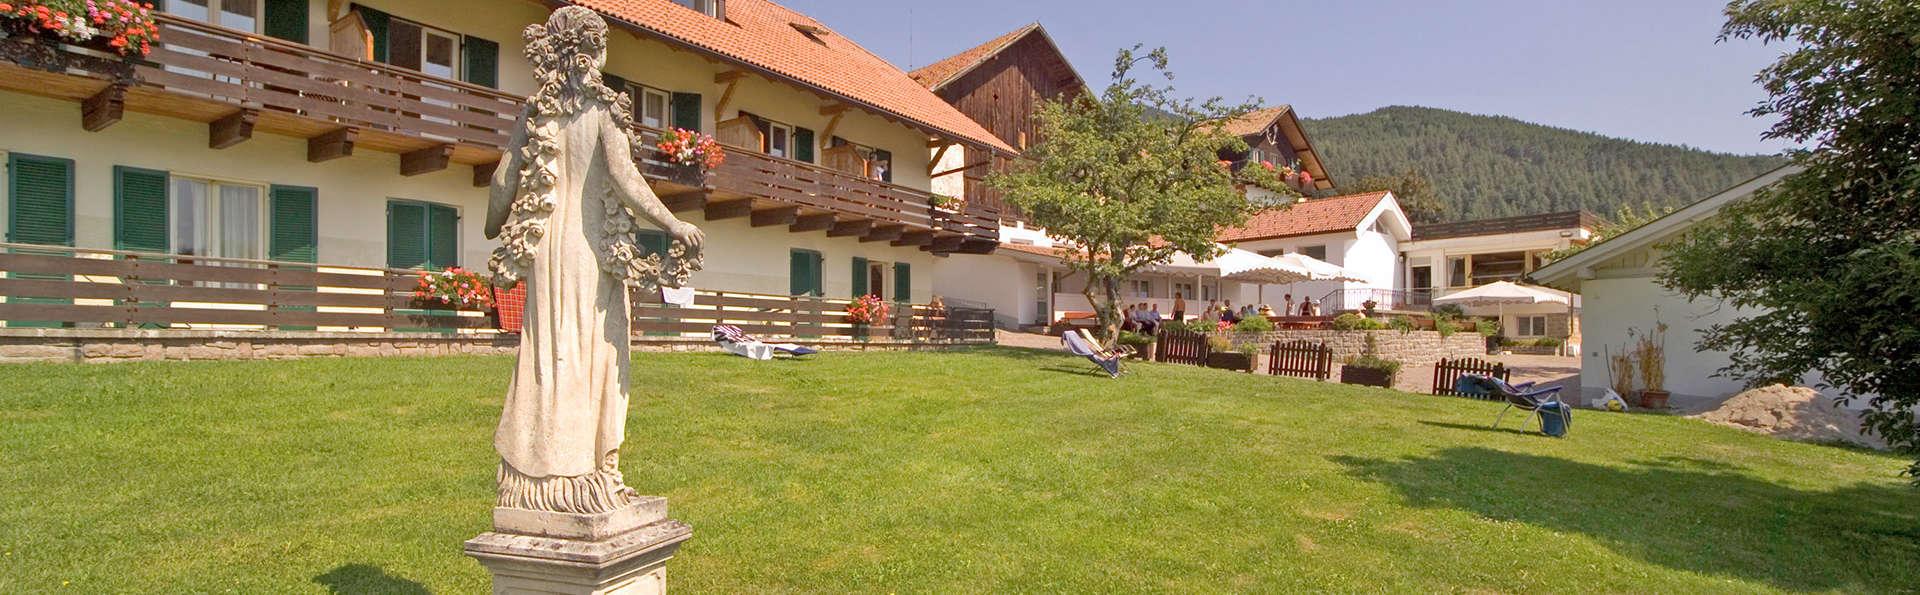 Naturhotel Wieserhof - Edit_garden.jpg